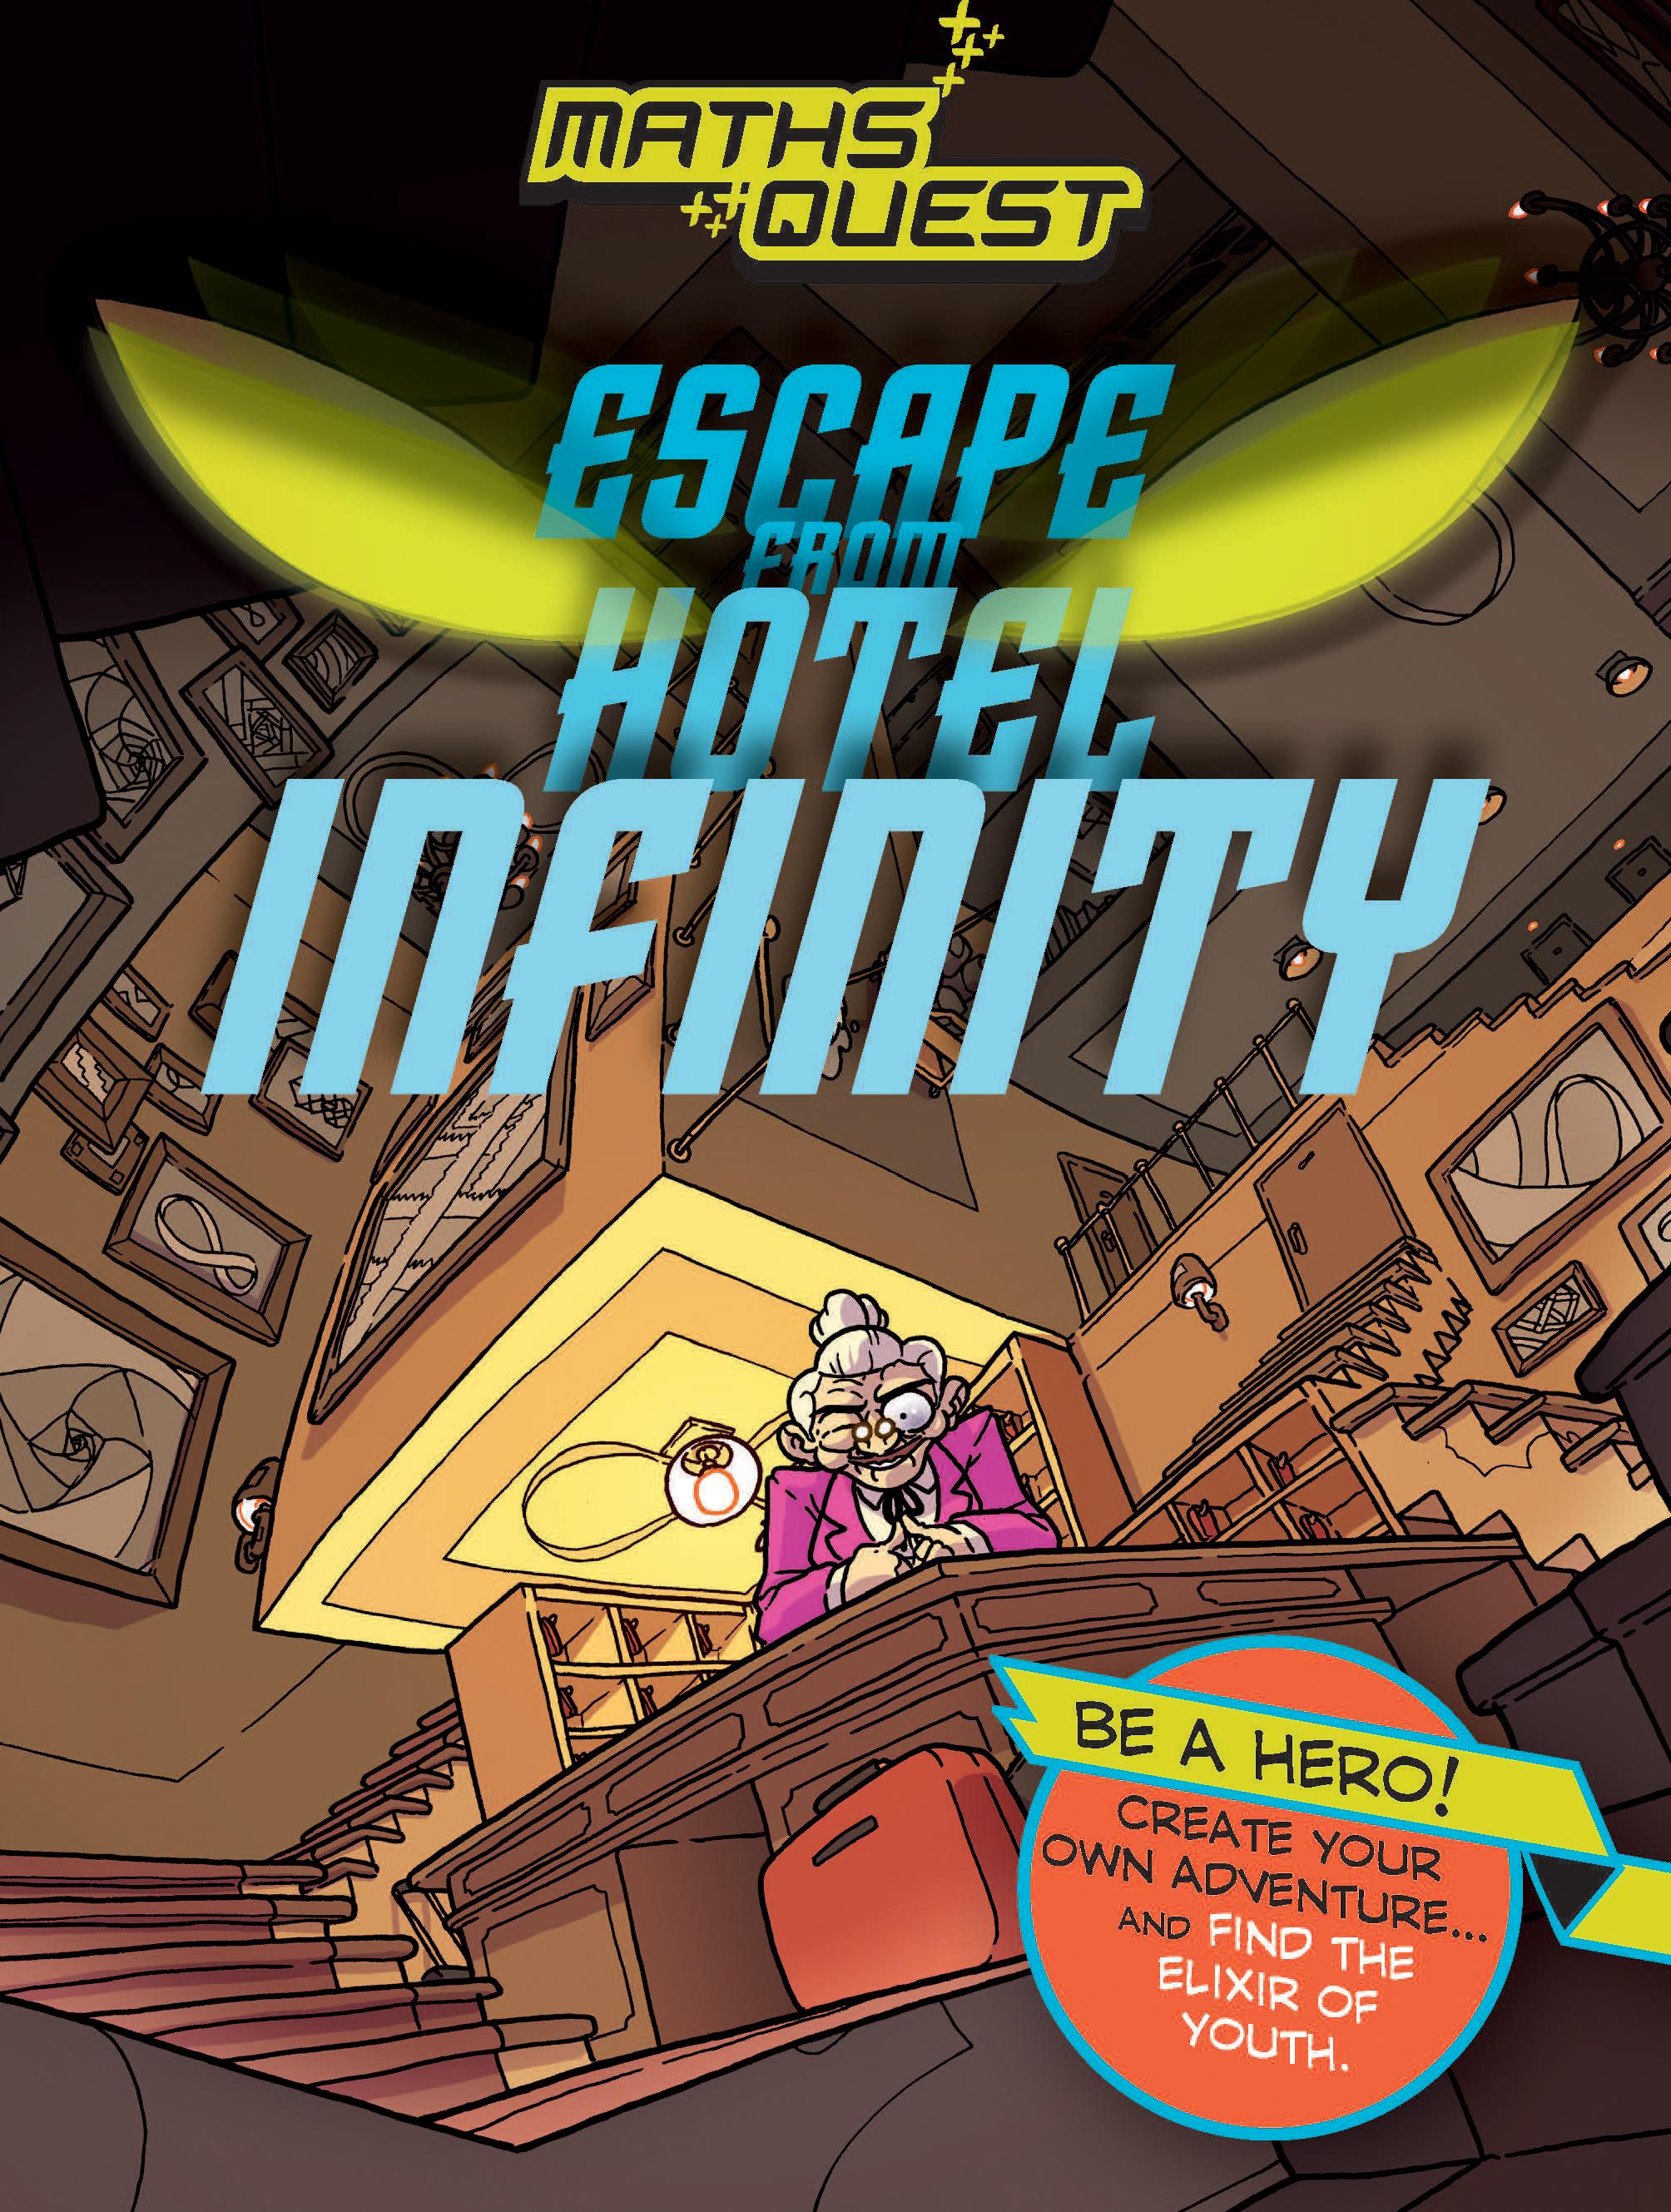 Illustrated Book Cover Quest : Escape from hotel infinity maths quest kjartan poskitt